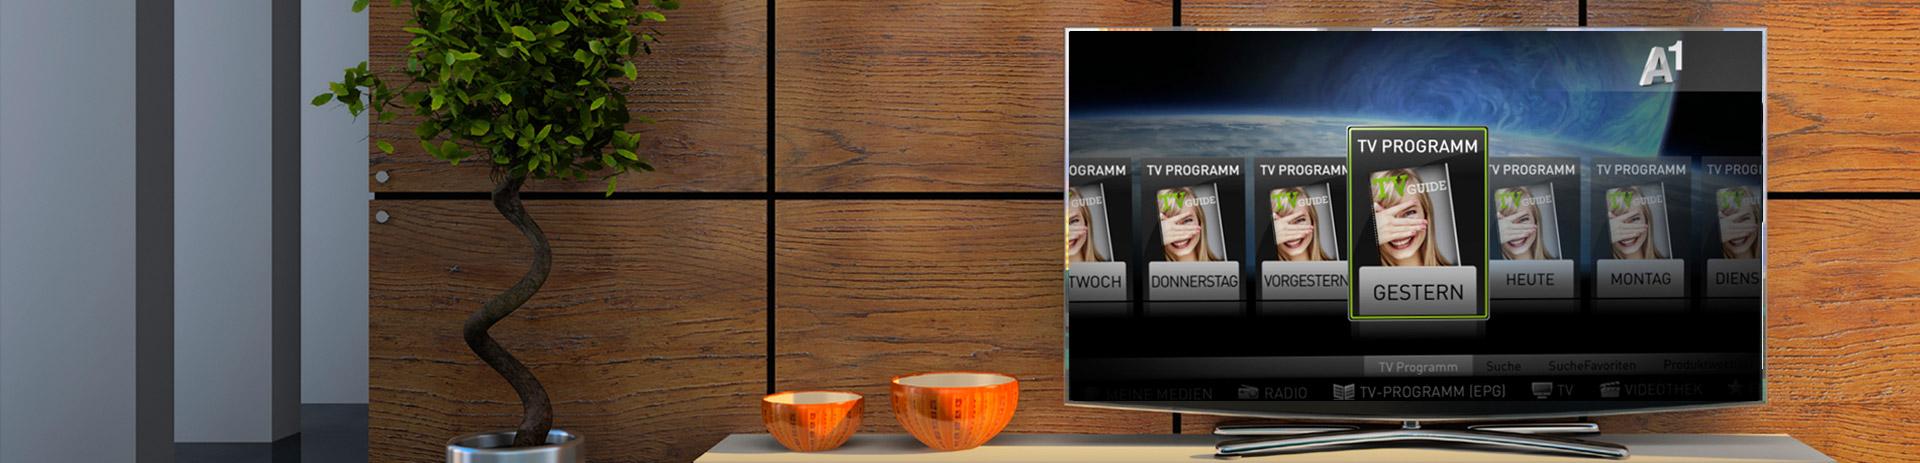 View Control: Online Videorecorder